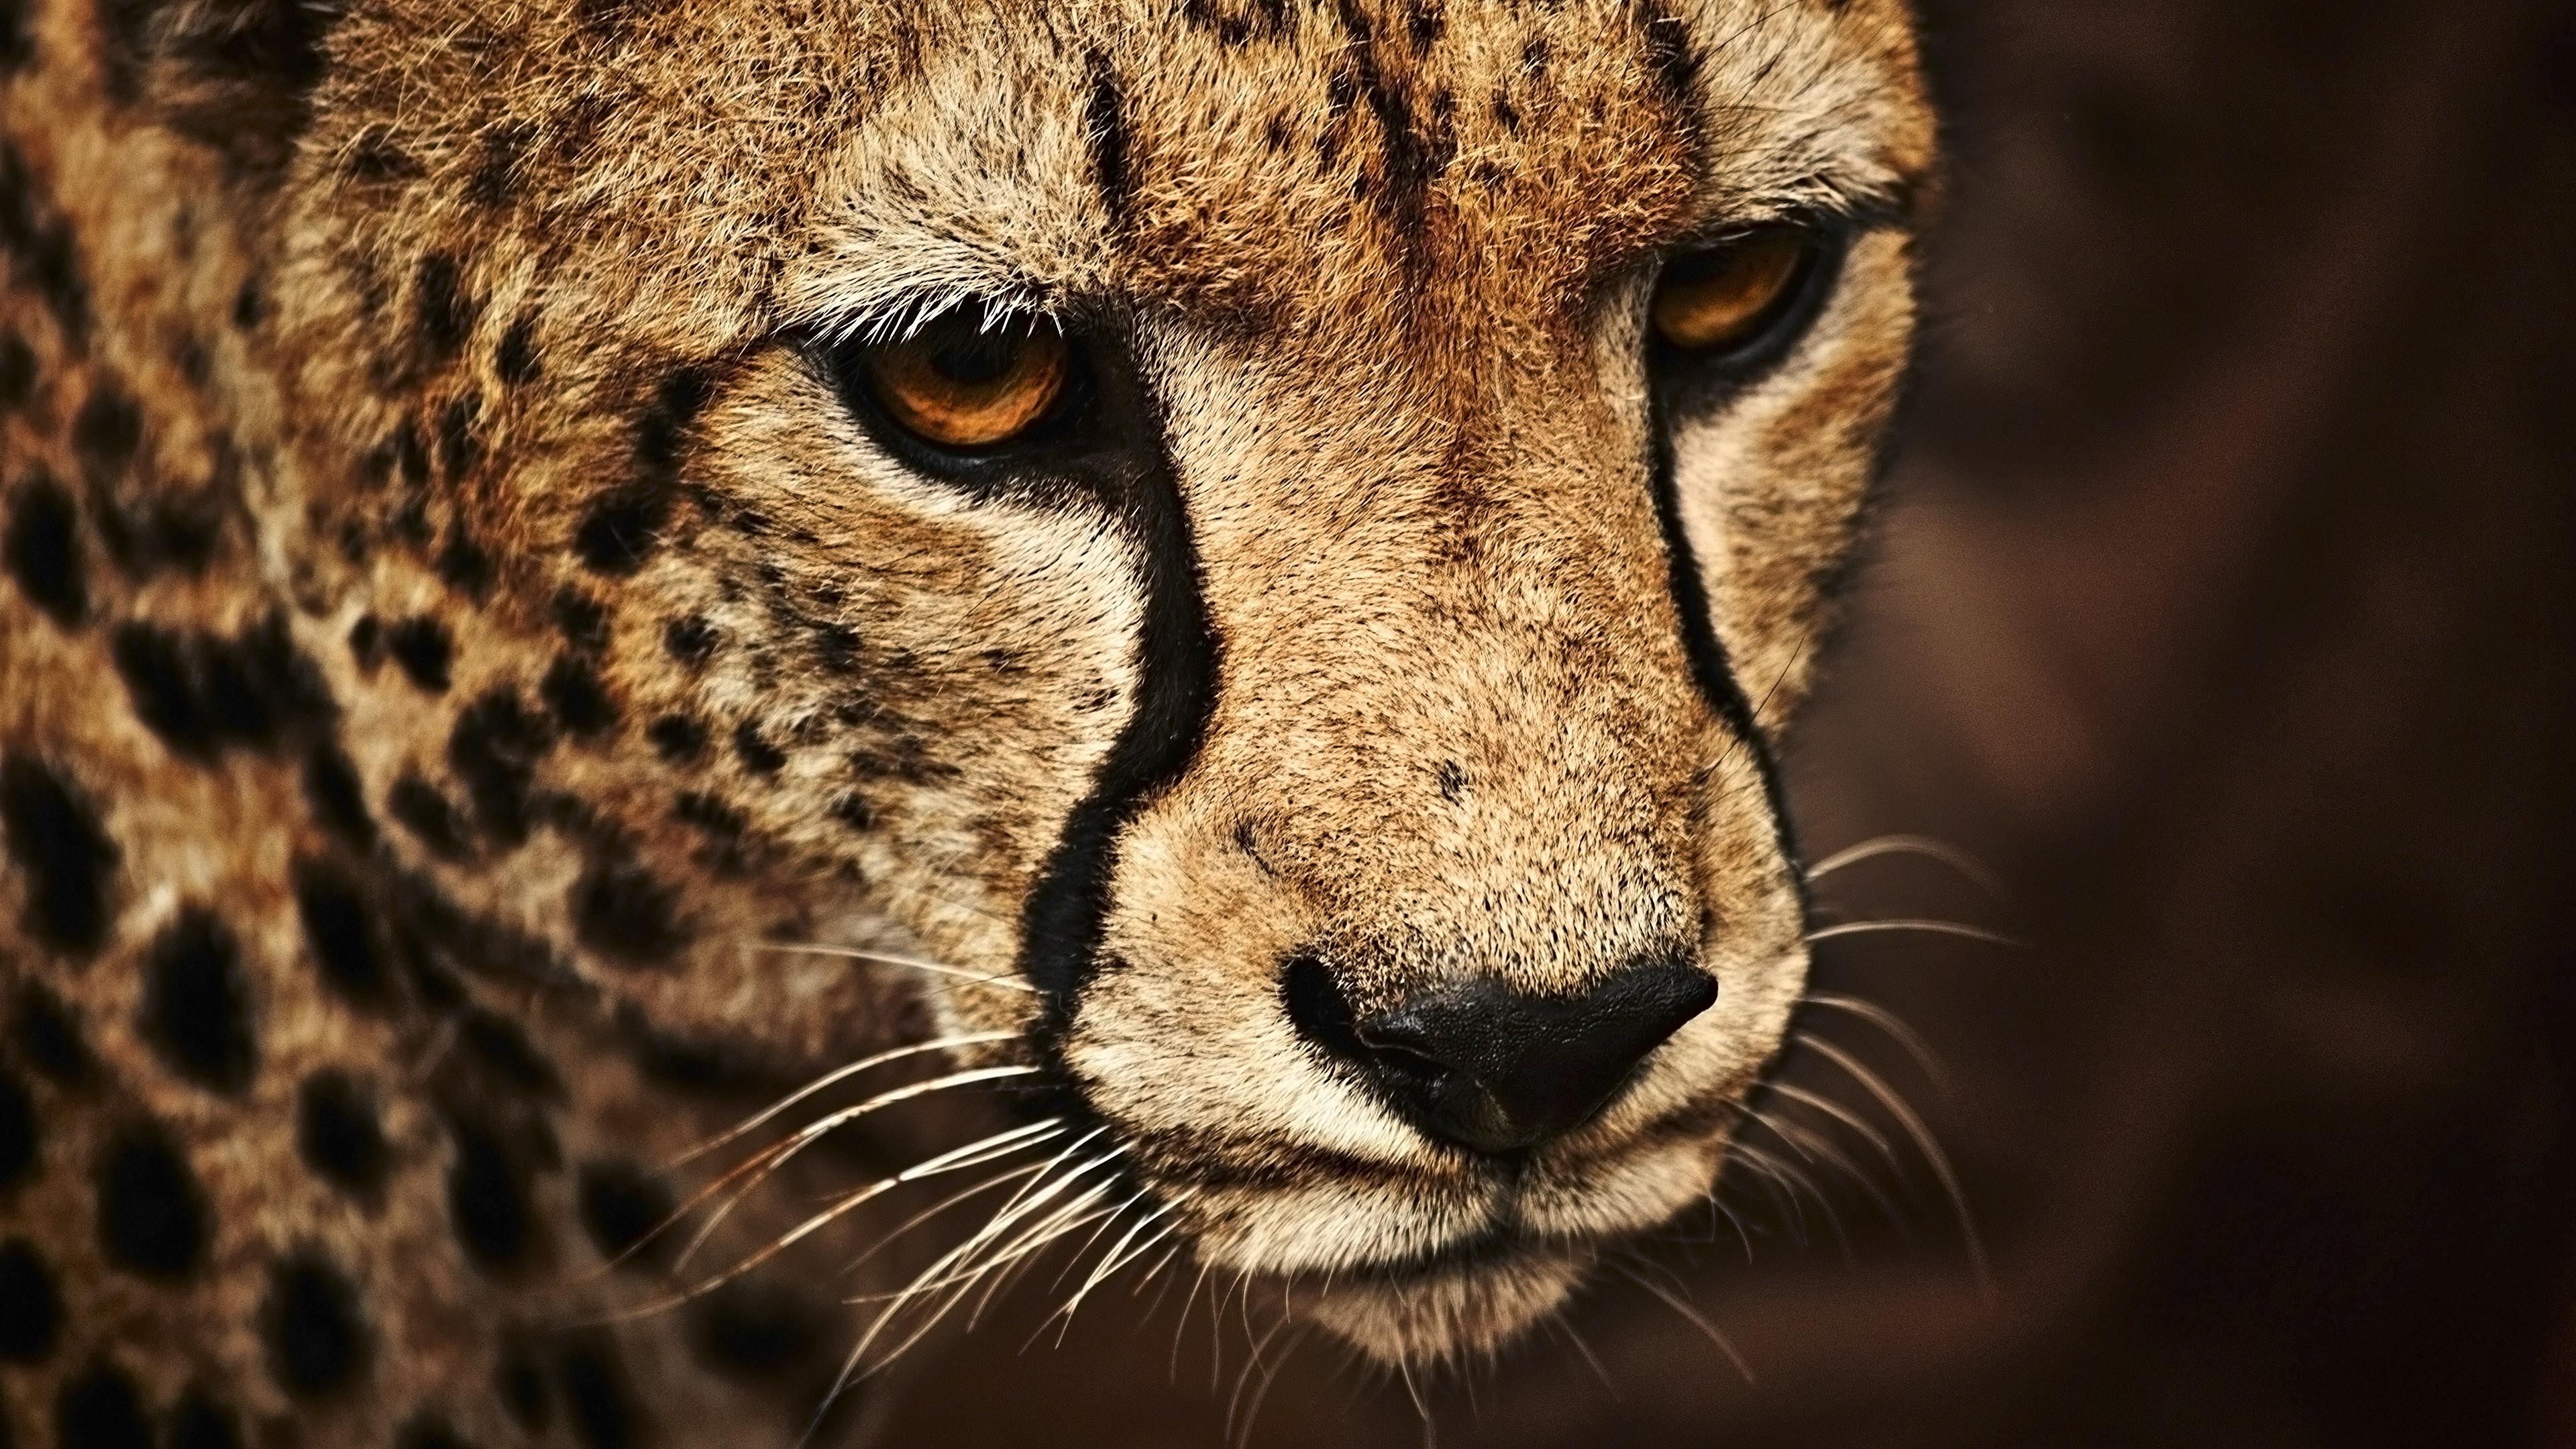 Wallpaper Cheetah Look Cute Animals Animals 5374